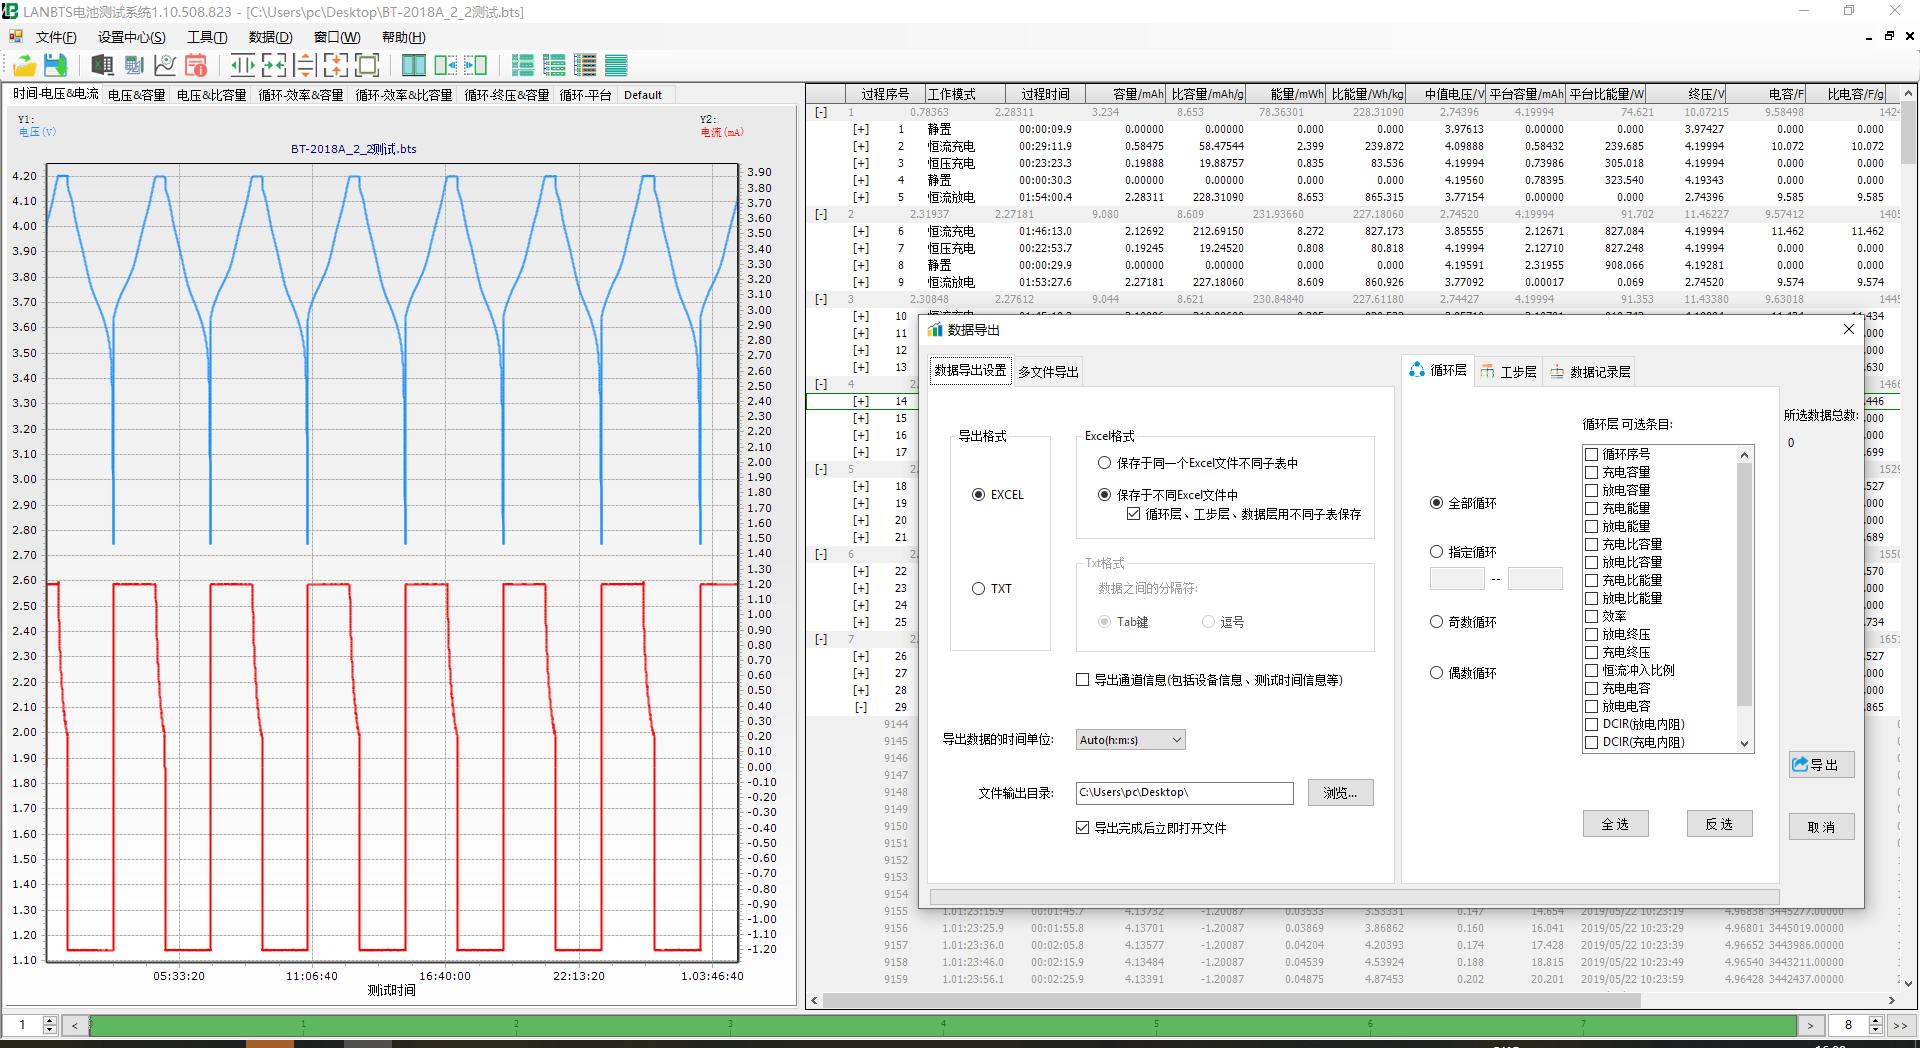 LANBTS数据分析软件界面.png